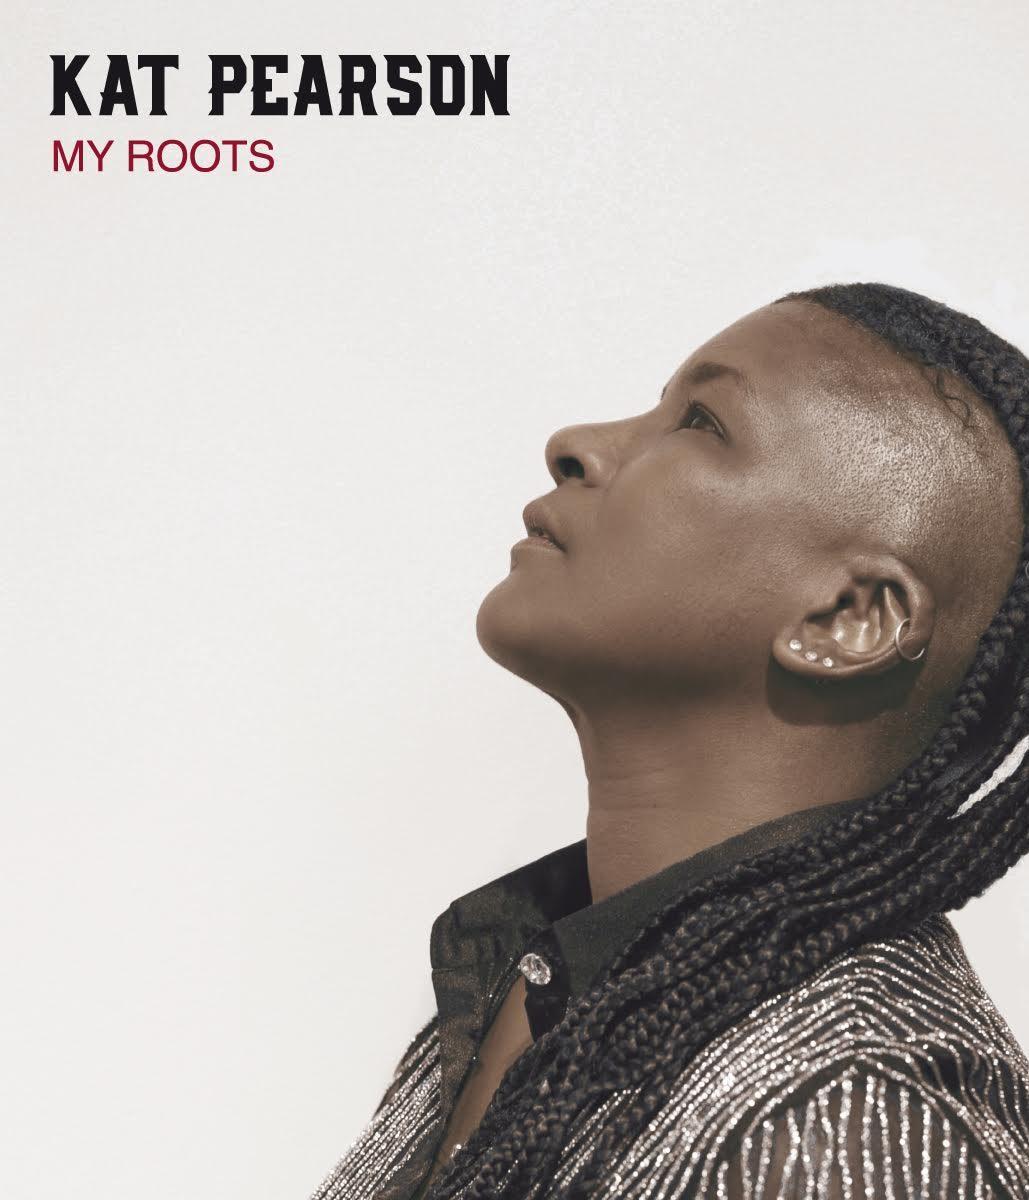 KAT PEARSON